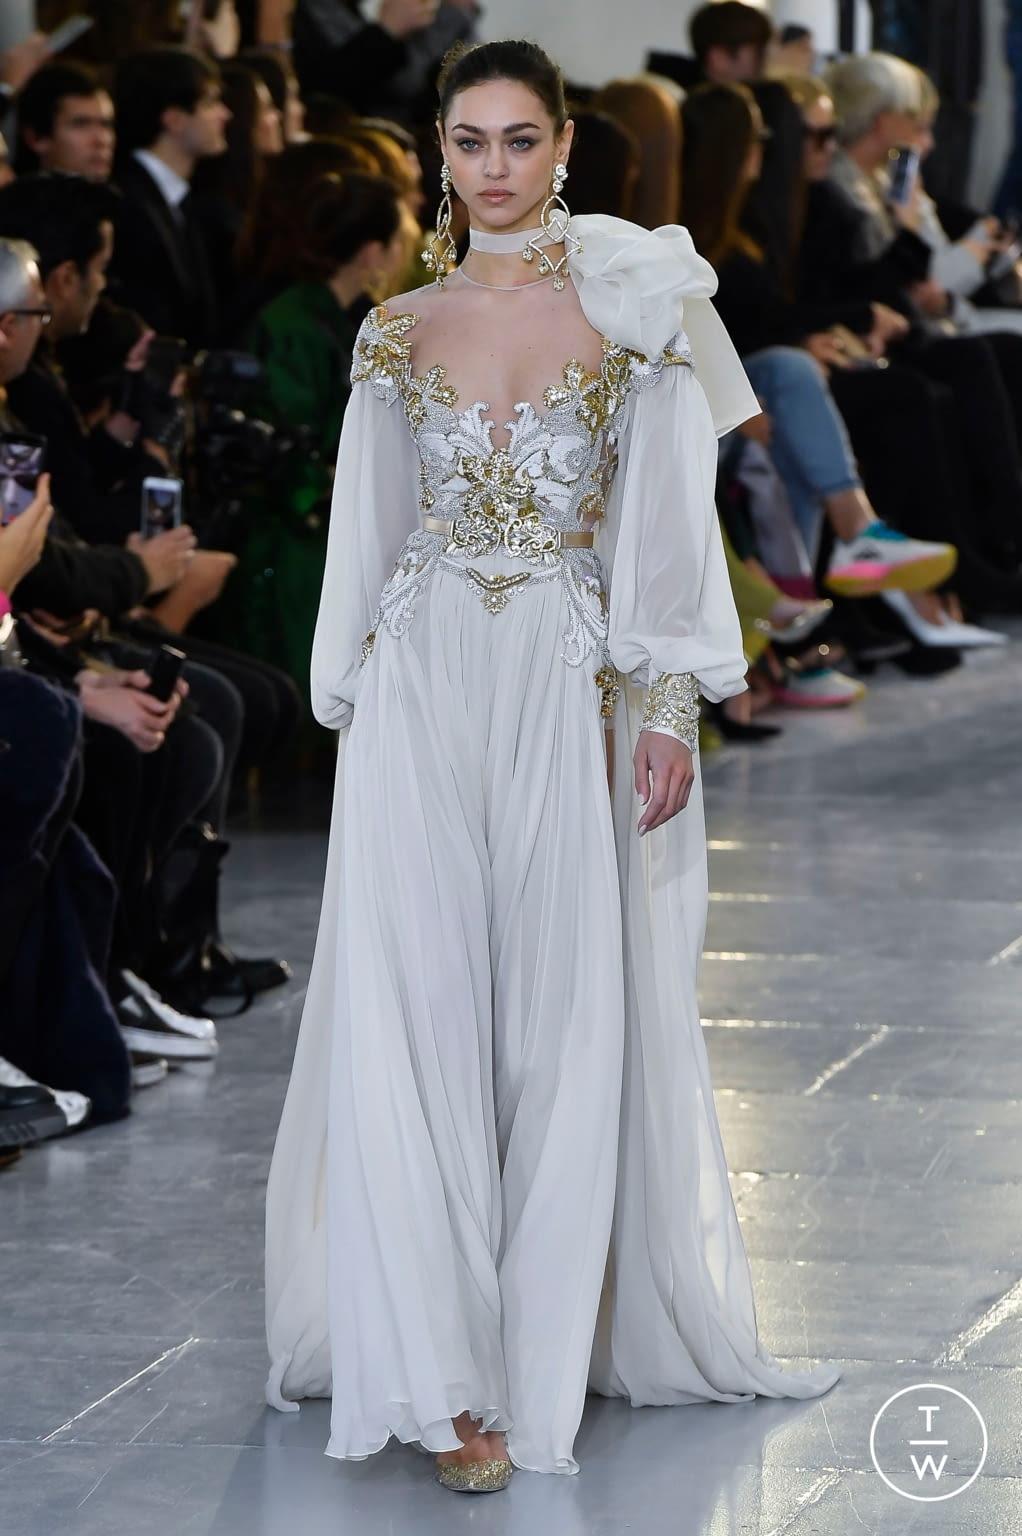 Elie Saab Ss20 Couture 56 The Fashion Search Engine Tagwalk